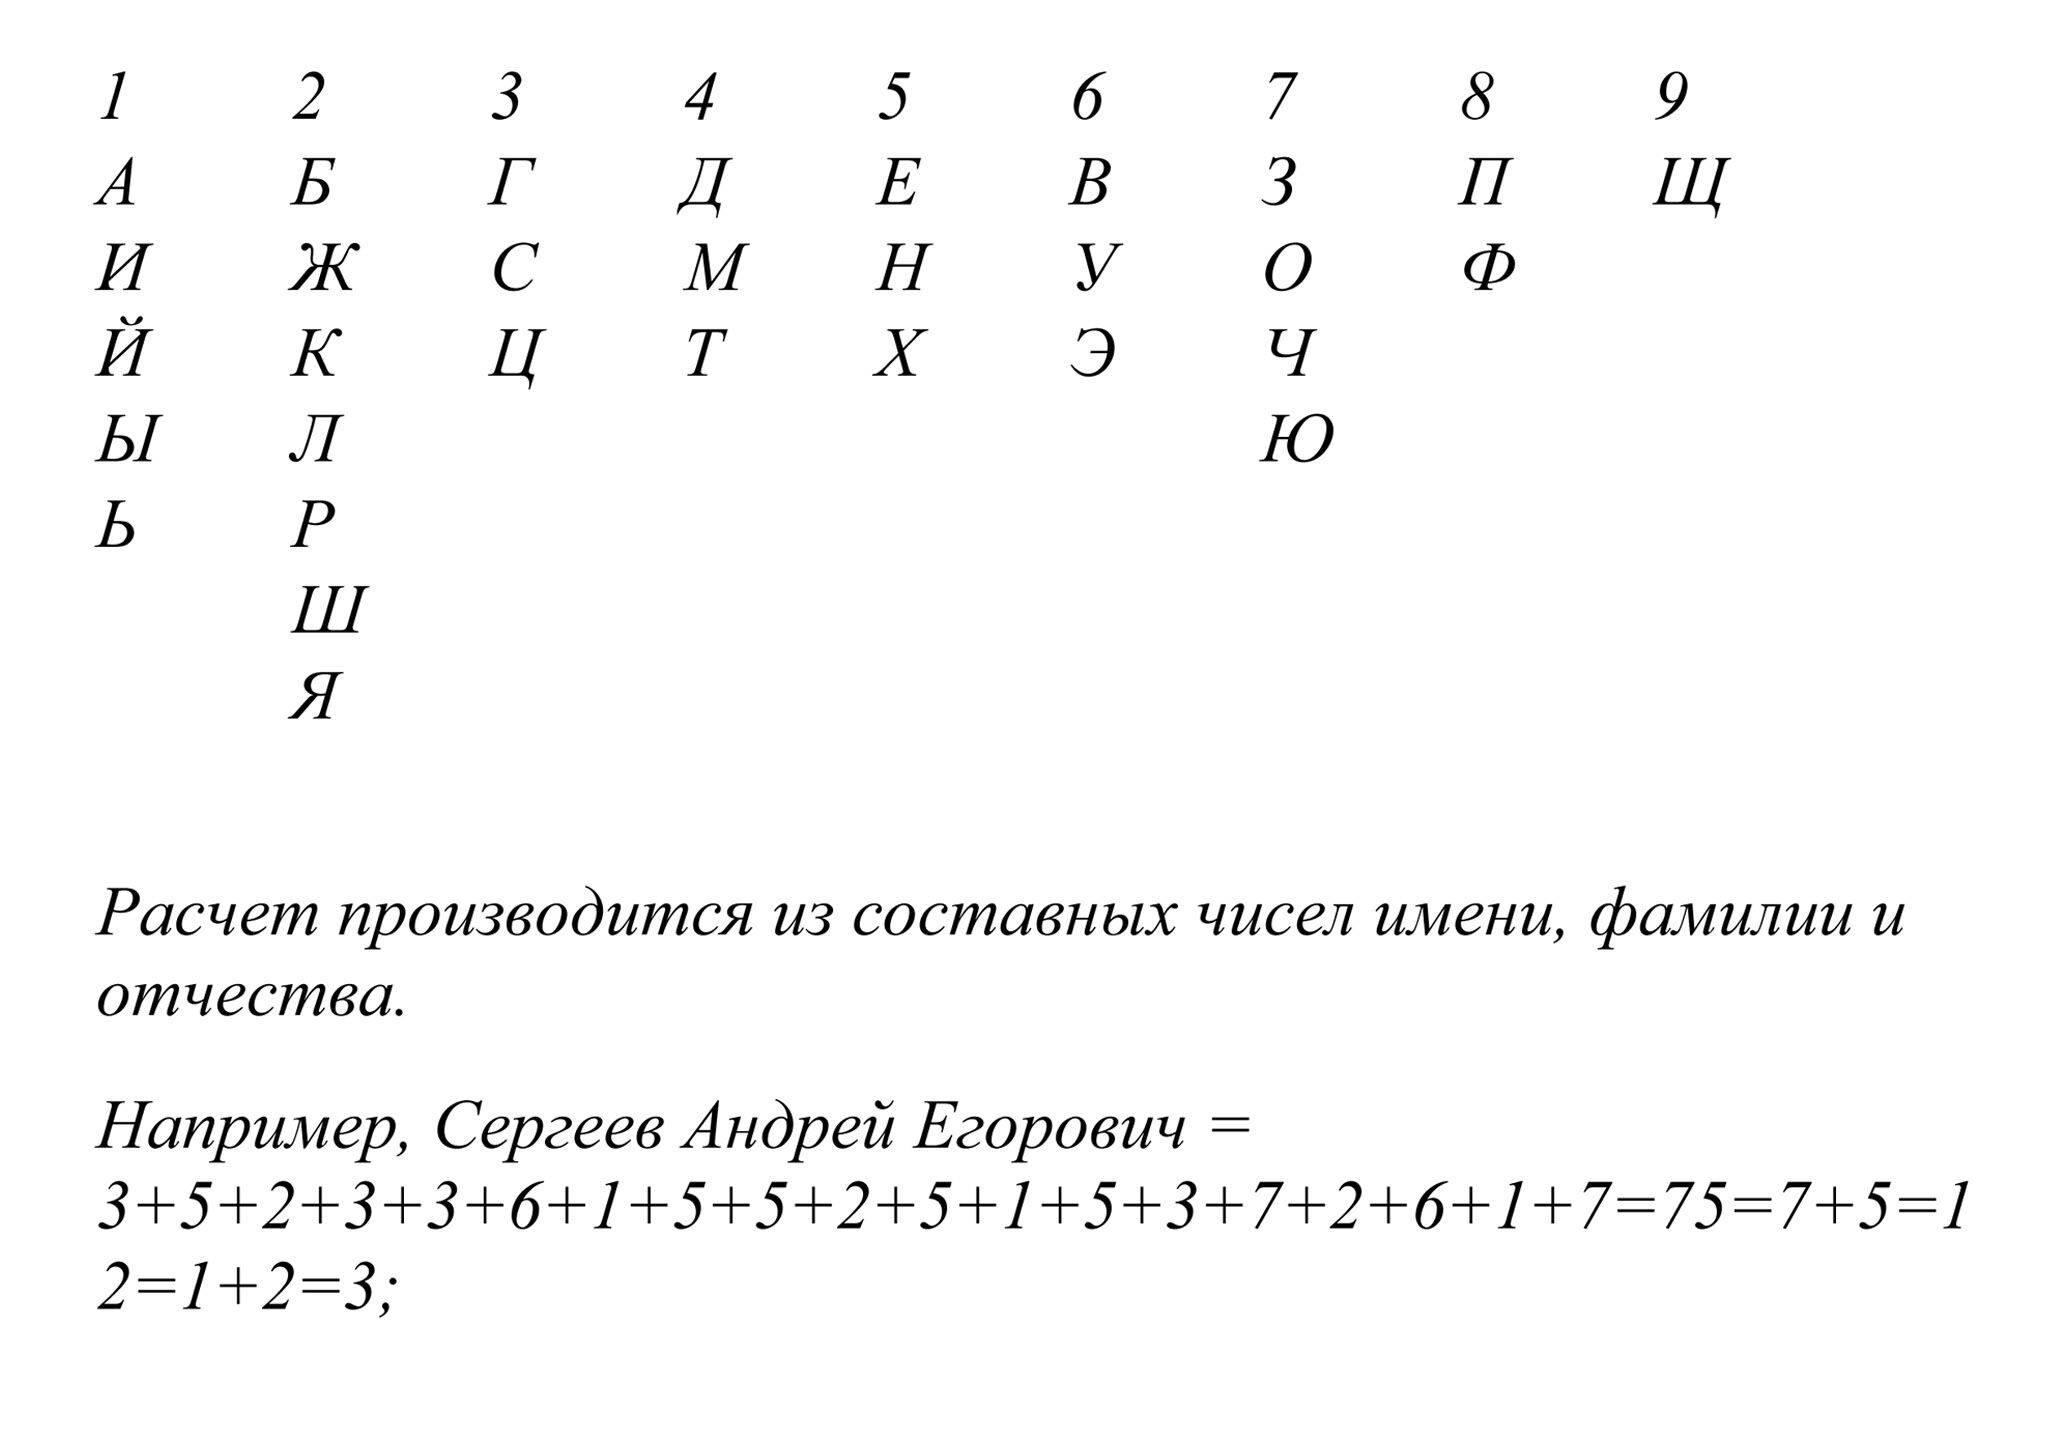 Нумерология по имени, фамилии, отчеству: все показатели